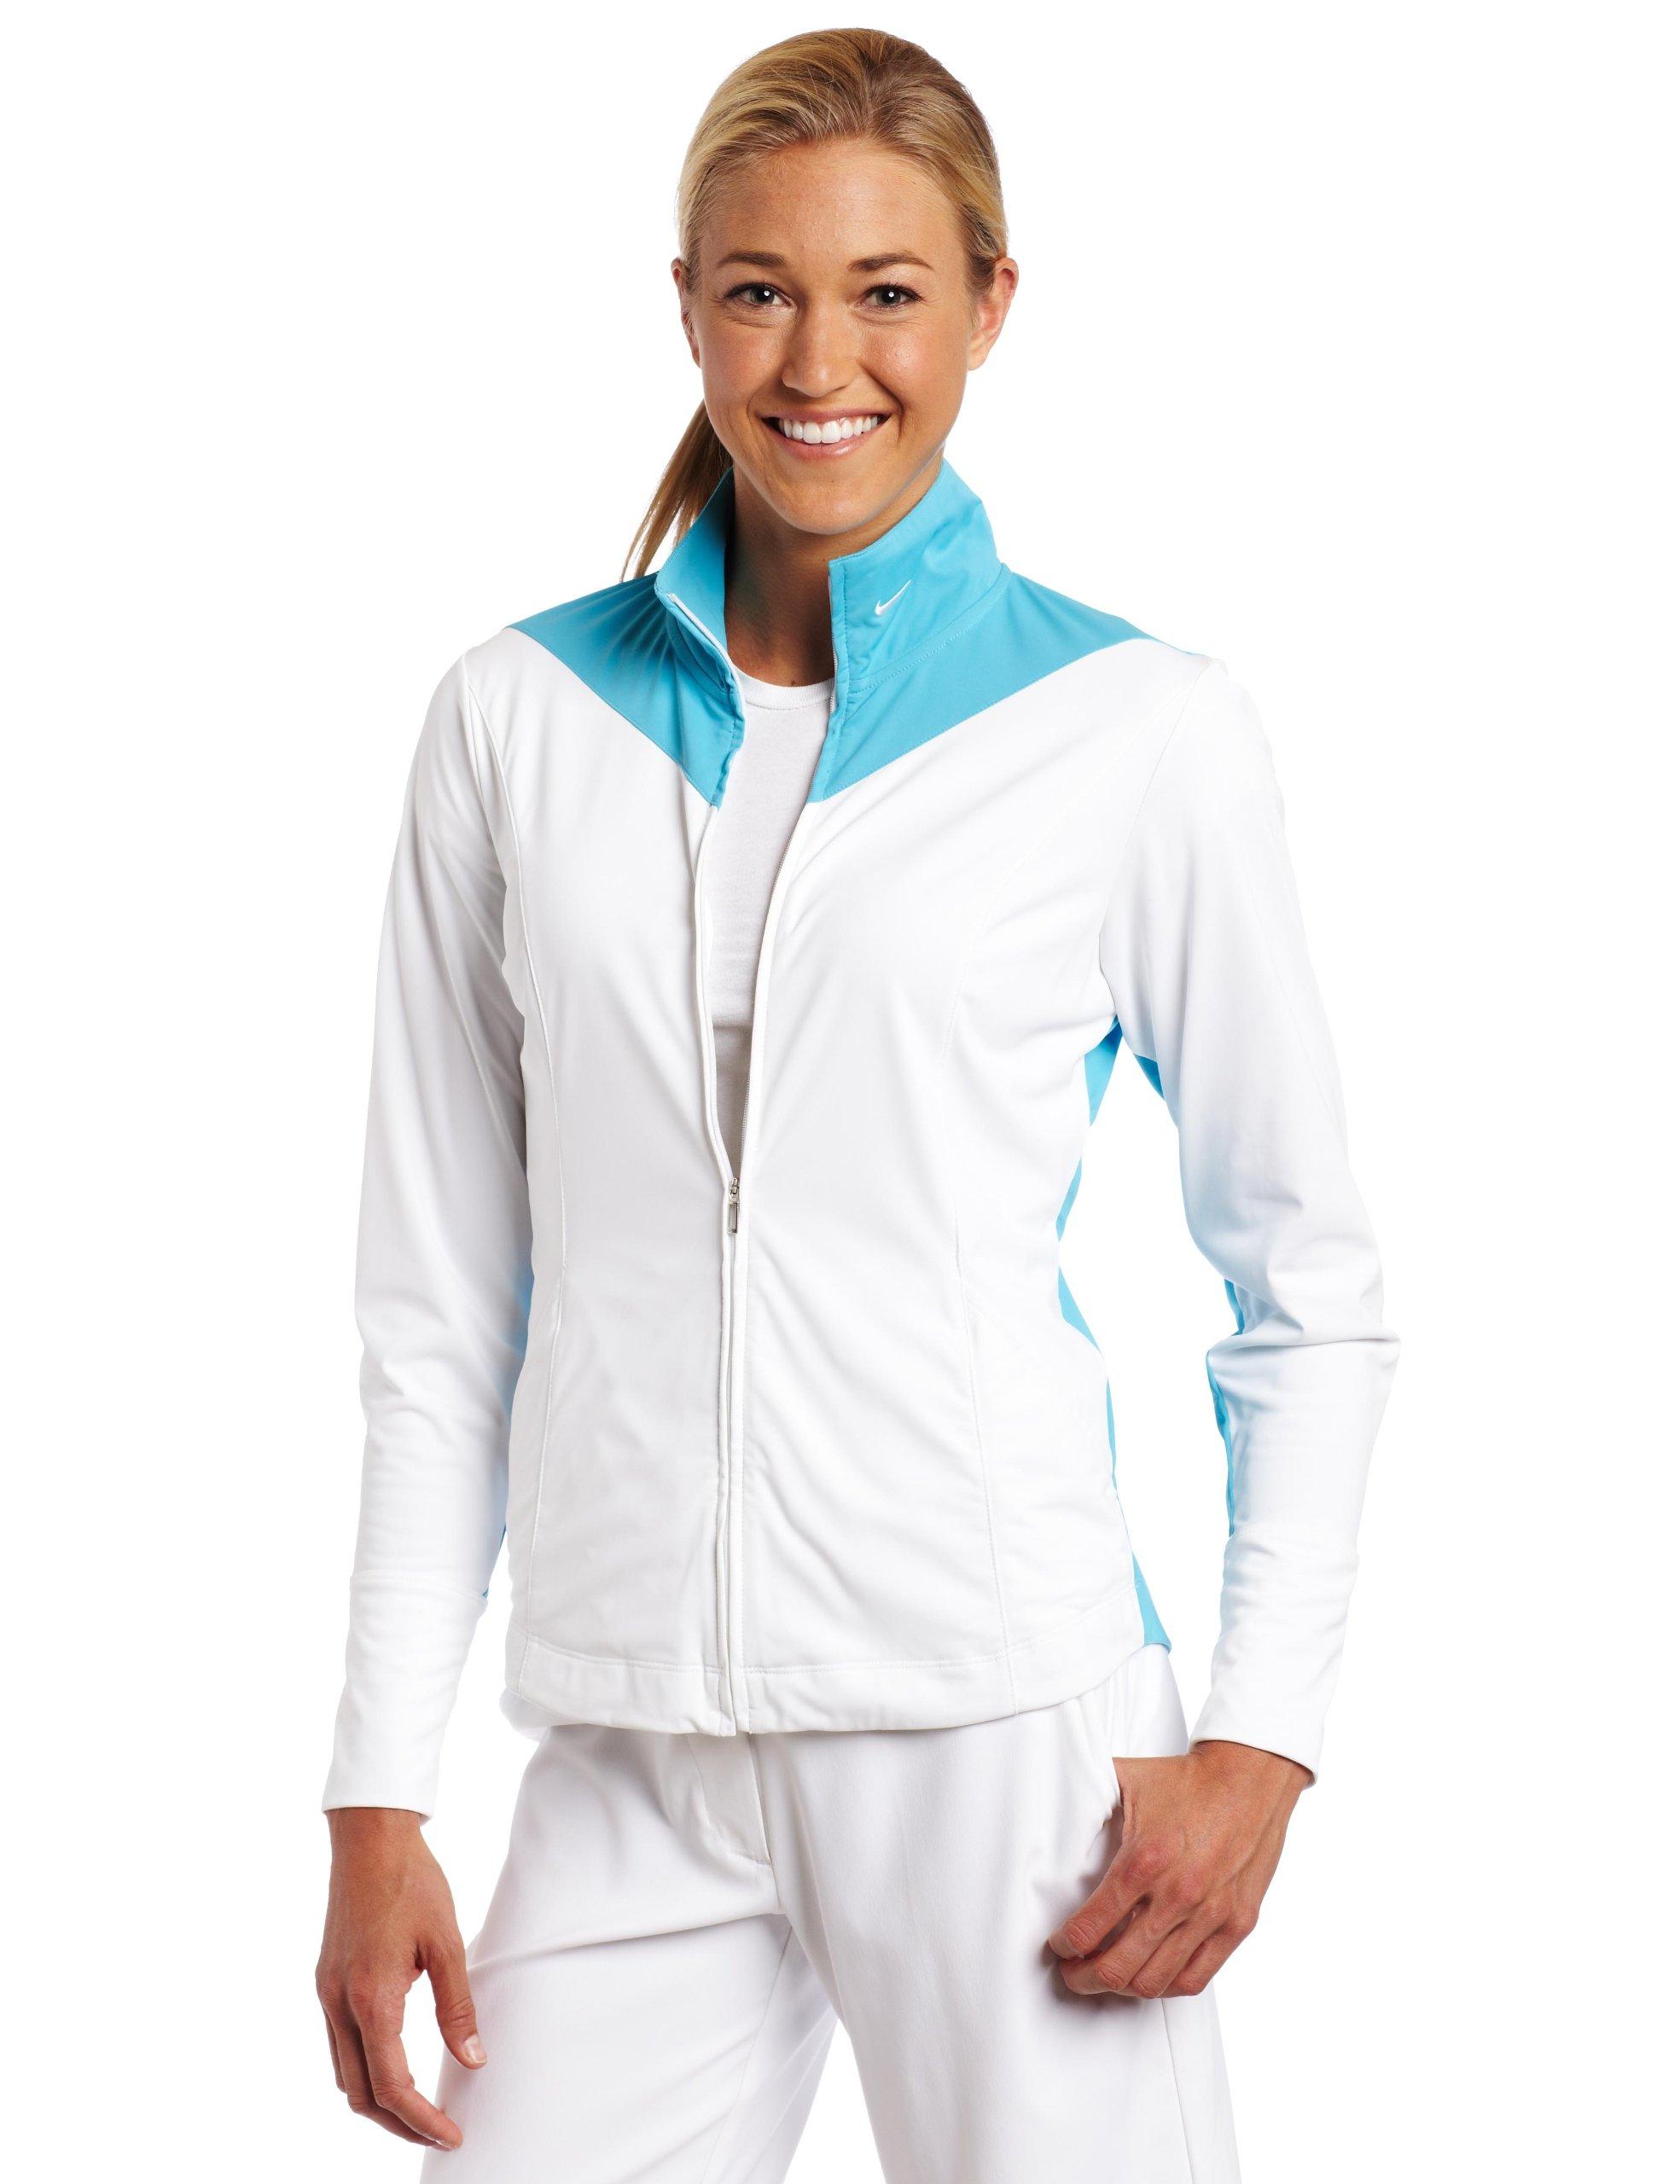 Nike Golf Women's Sport Tech Cover Up (White/Chlorine Blue, X-Small)